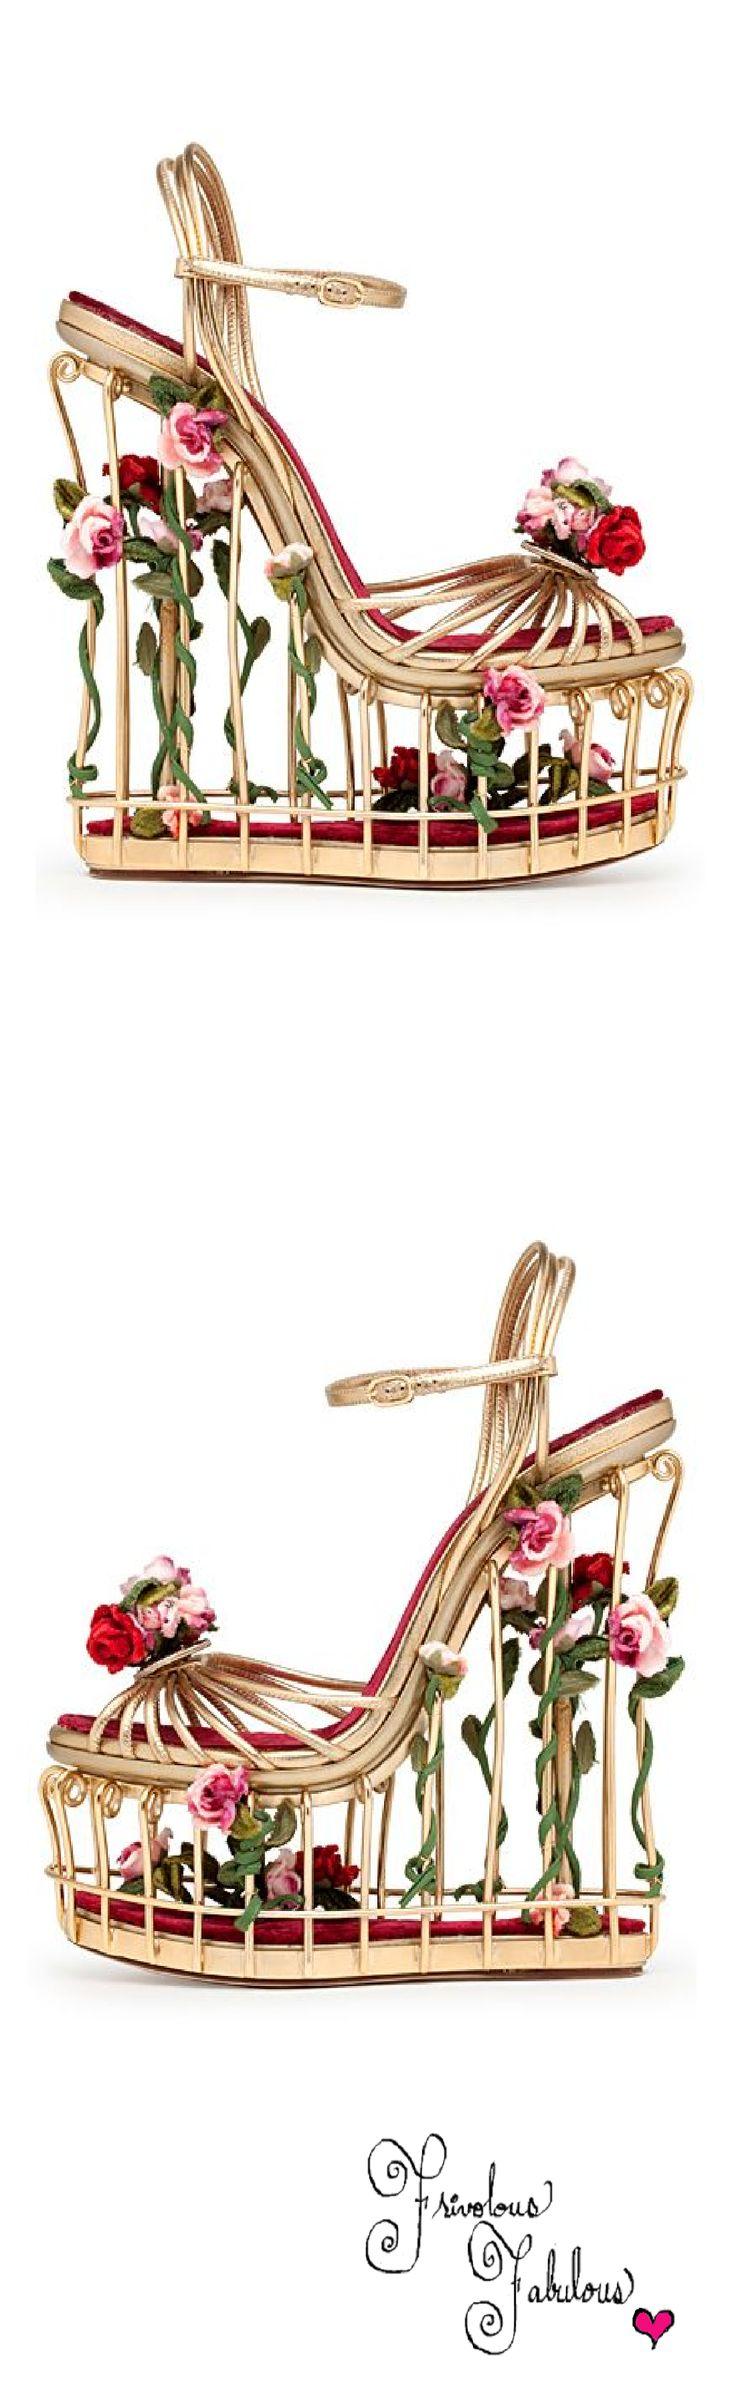 Dolce & Gabbana caged platforms   House of Beccaria~ 1613053 양지희: 화사하고 예뻐서 여성들의 마음을 혹하게 하긴하지만 평소에 신고다니기에는 과한면이 있어서 대중성은 조금 부족하지않나 하는 생각이 듭니다.